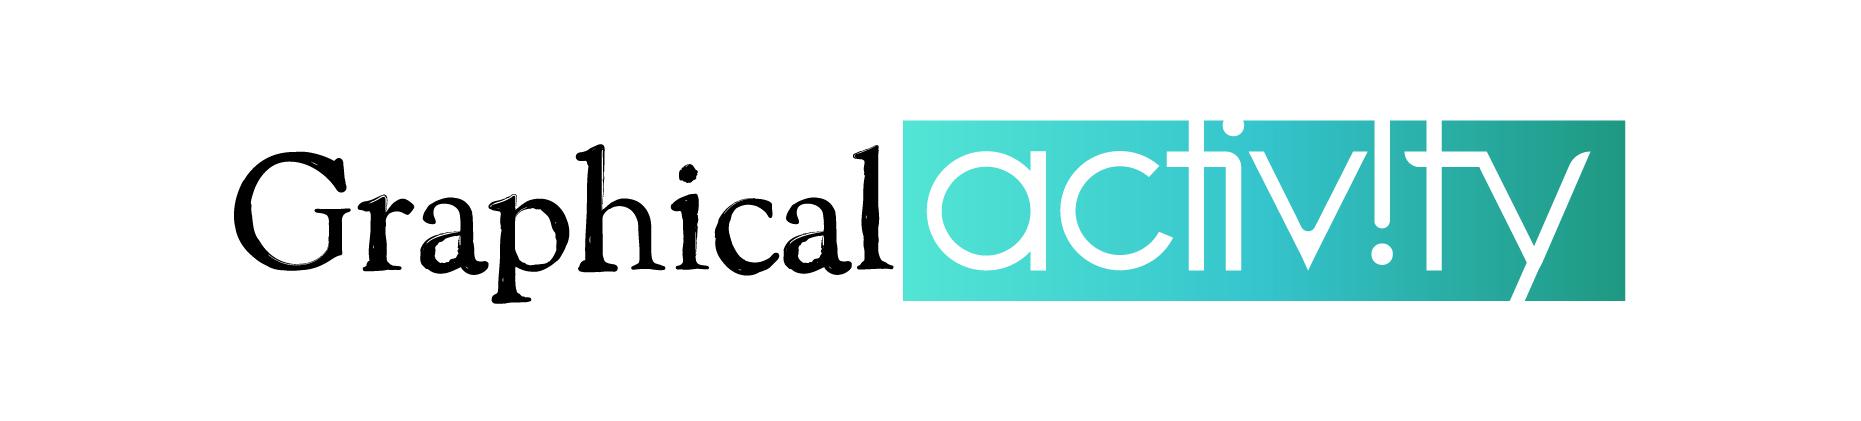 graphical-activity-logo-header-04